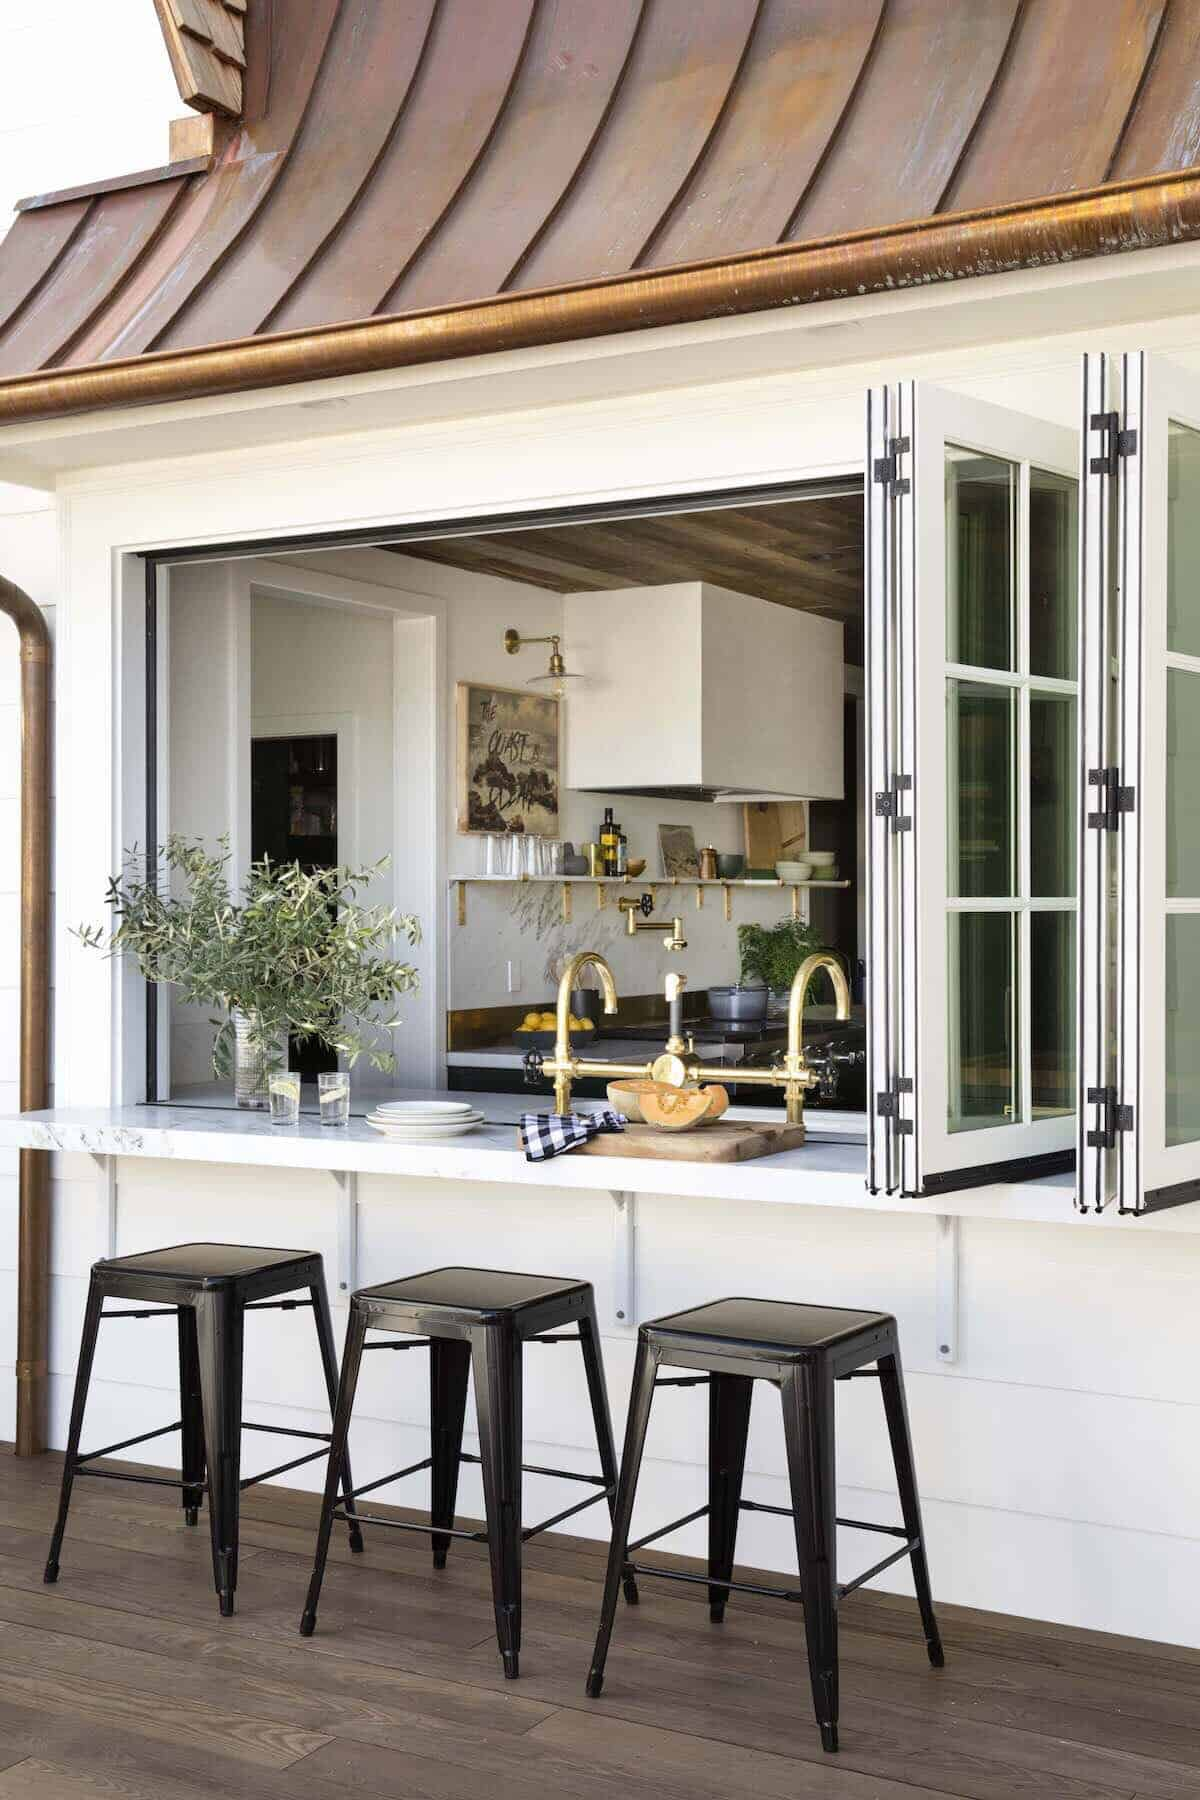 dutch-colonial-farmhouse-outdoor-pass-through-kitchen